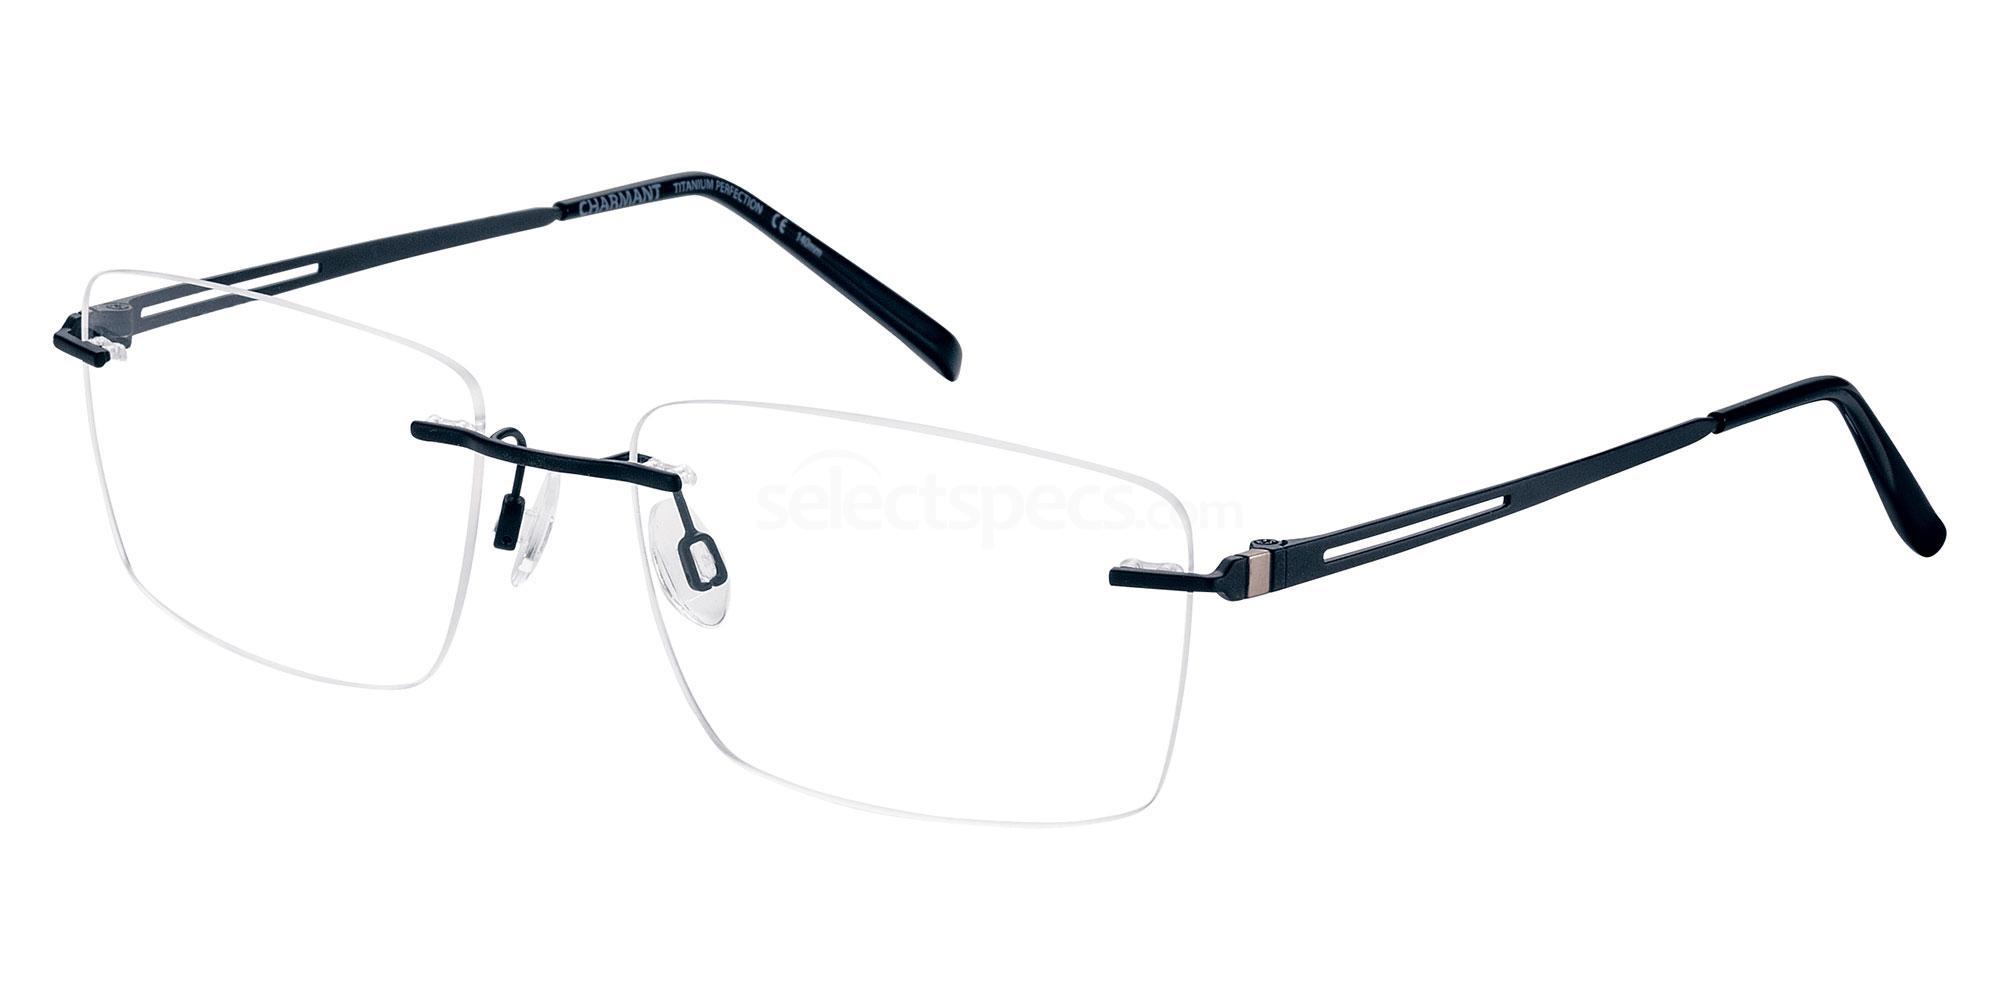 BK CH10978 Glasses, Charmant Titanium Perfection